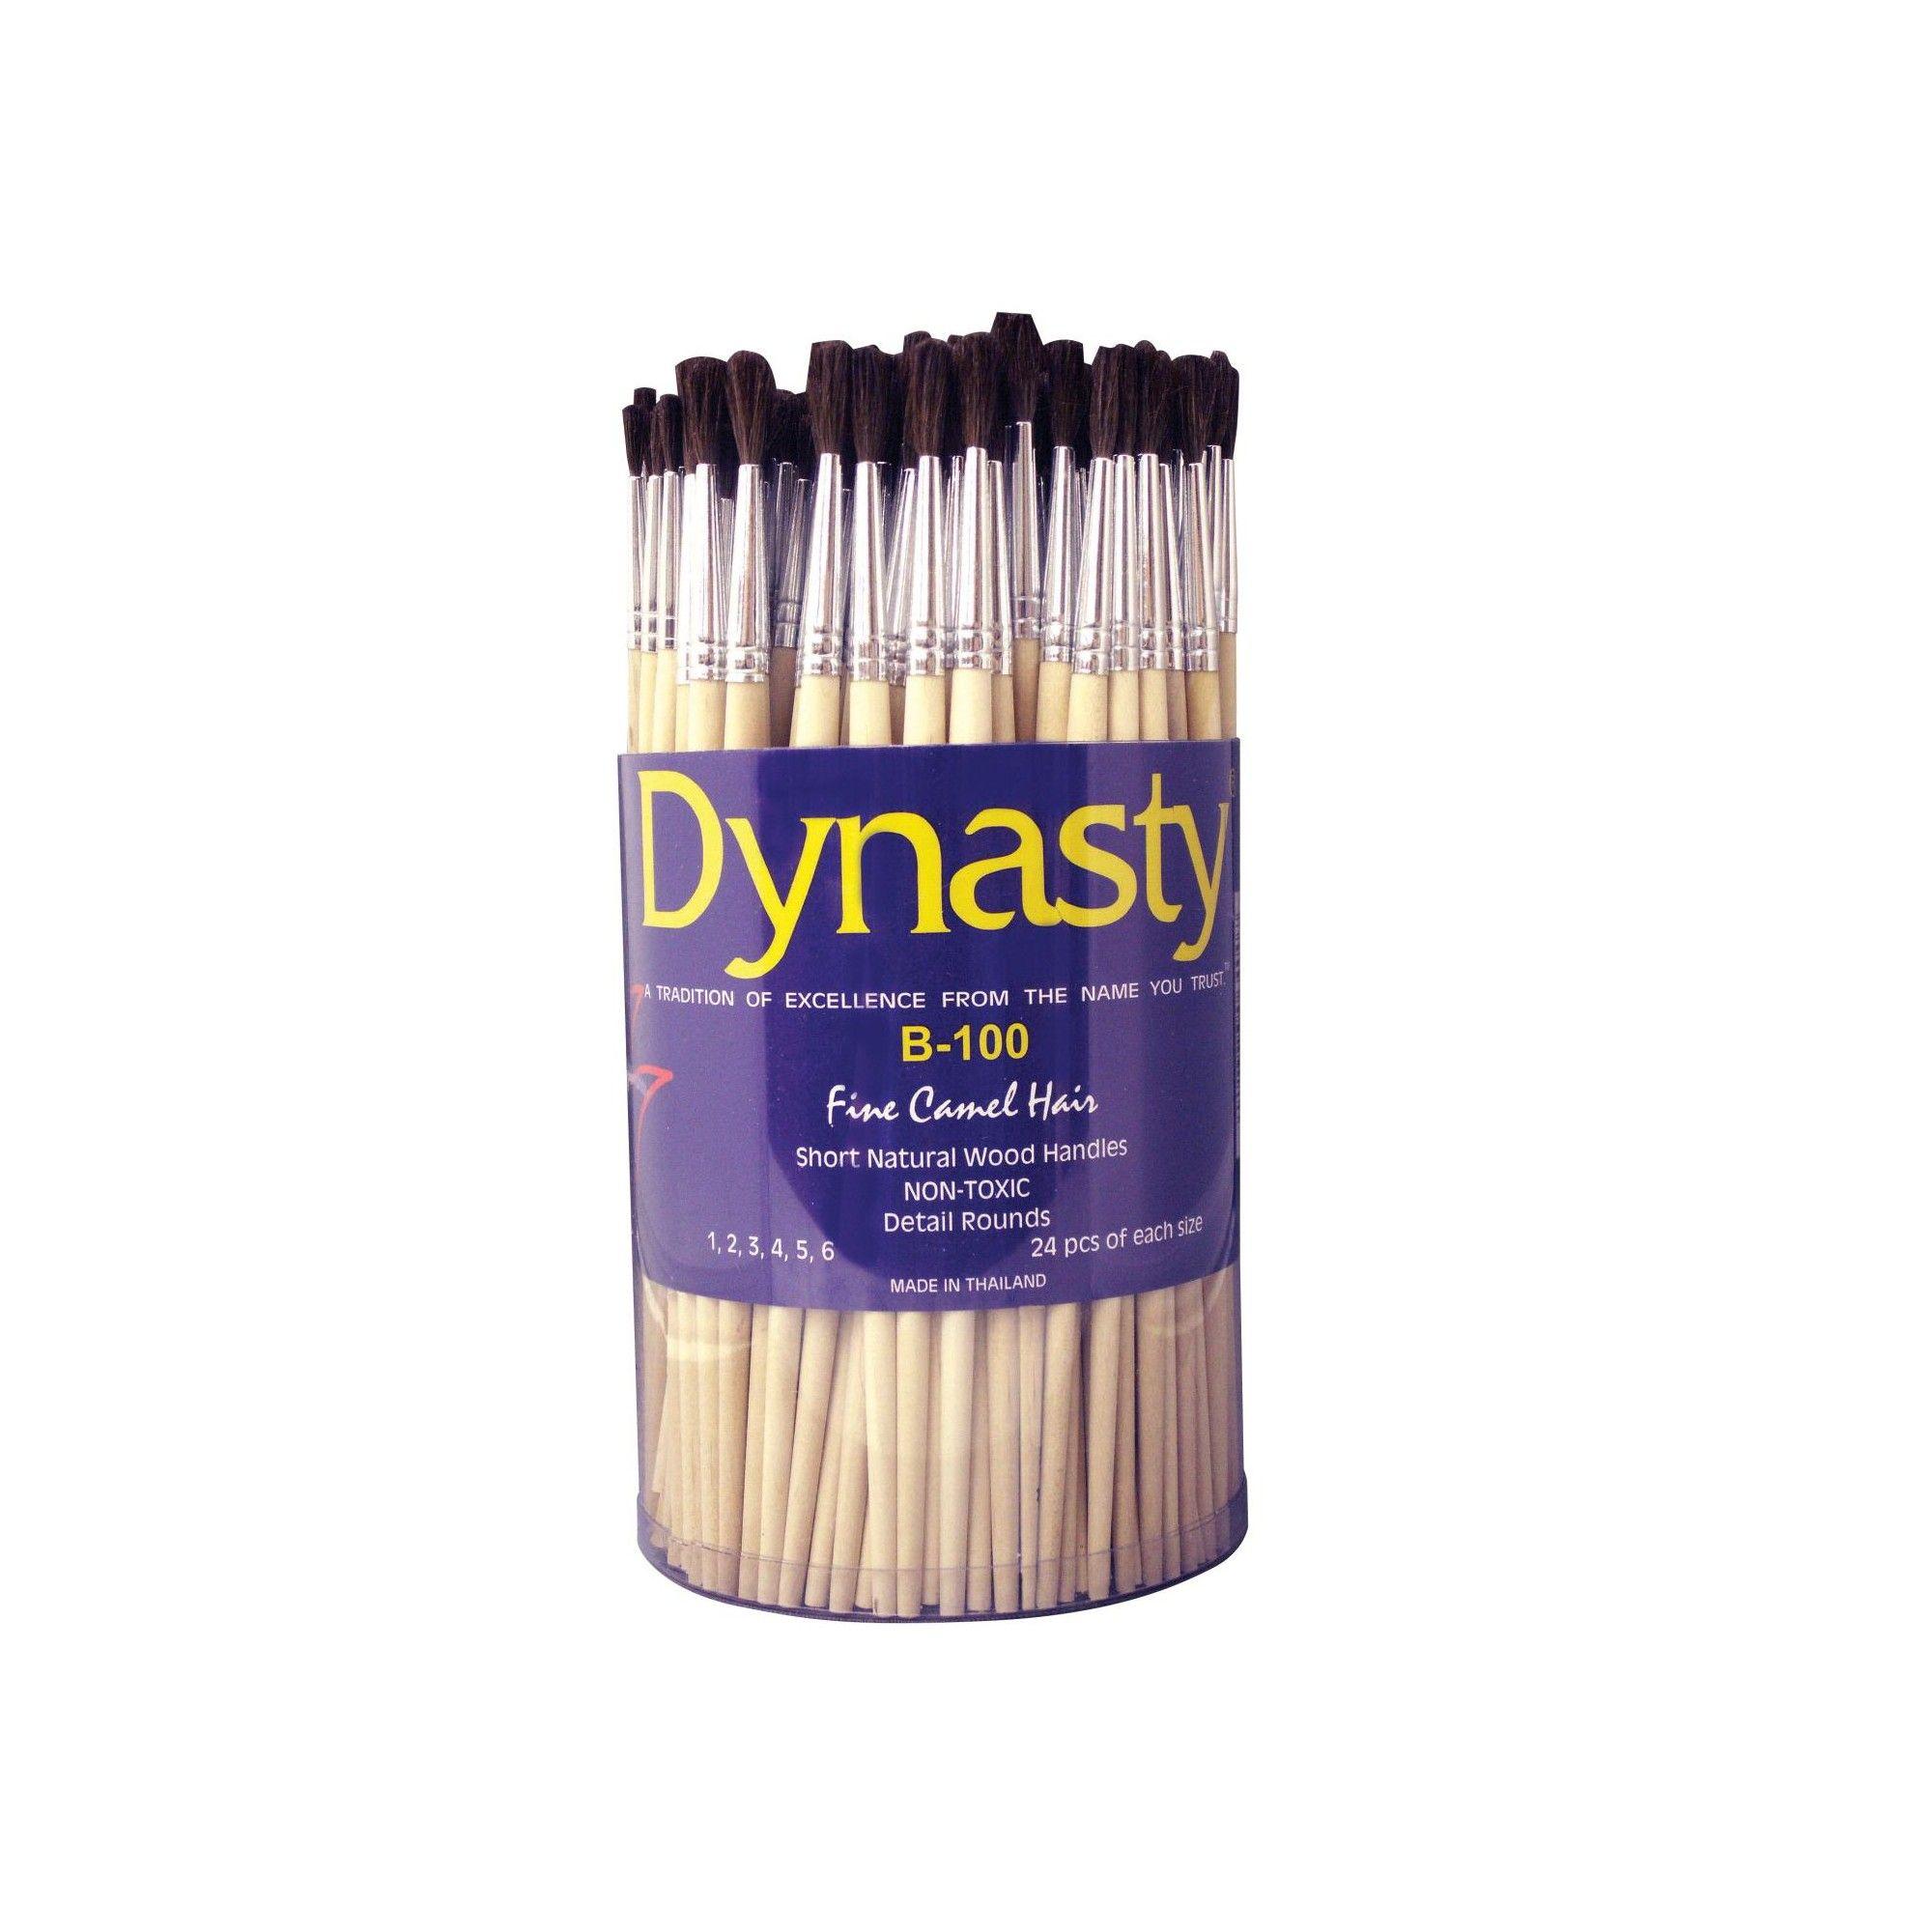 Dynasty B-100 Round Fine Camel Hair Short Wood Handle Paint Brush Assortment,